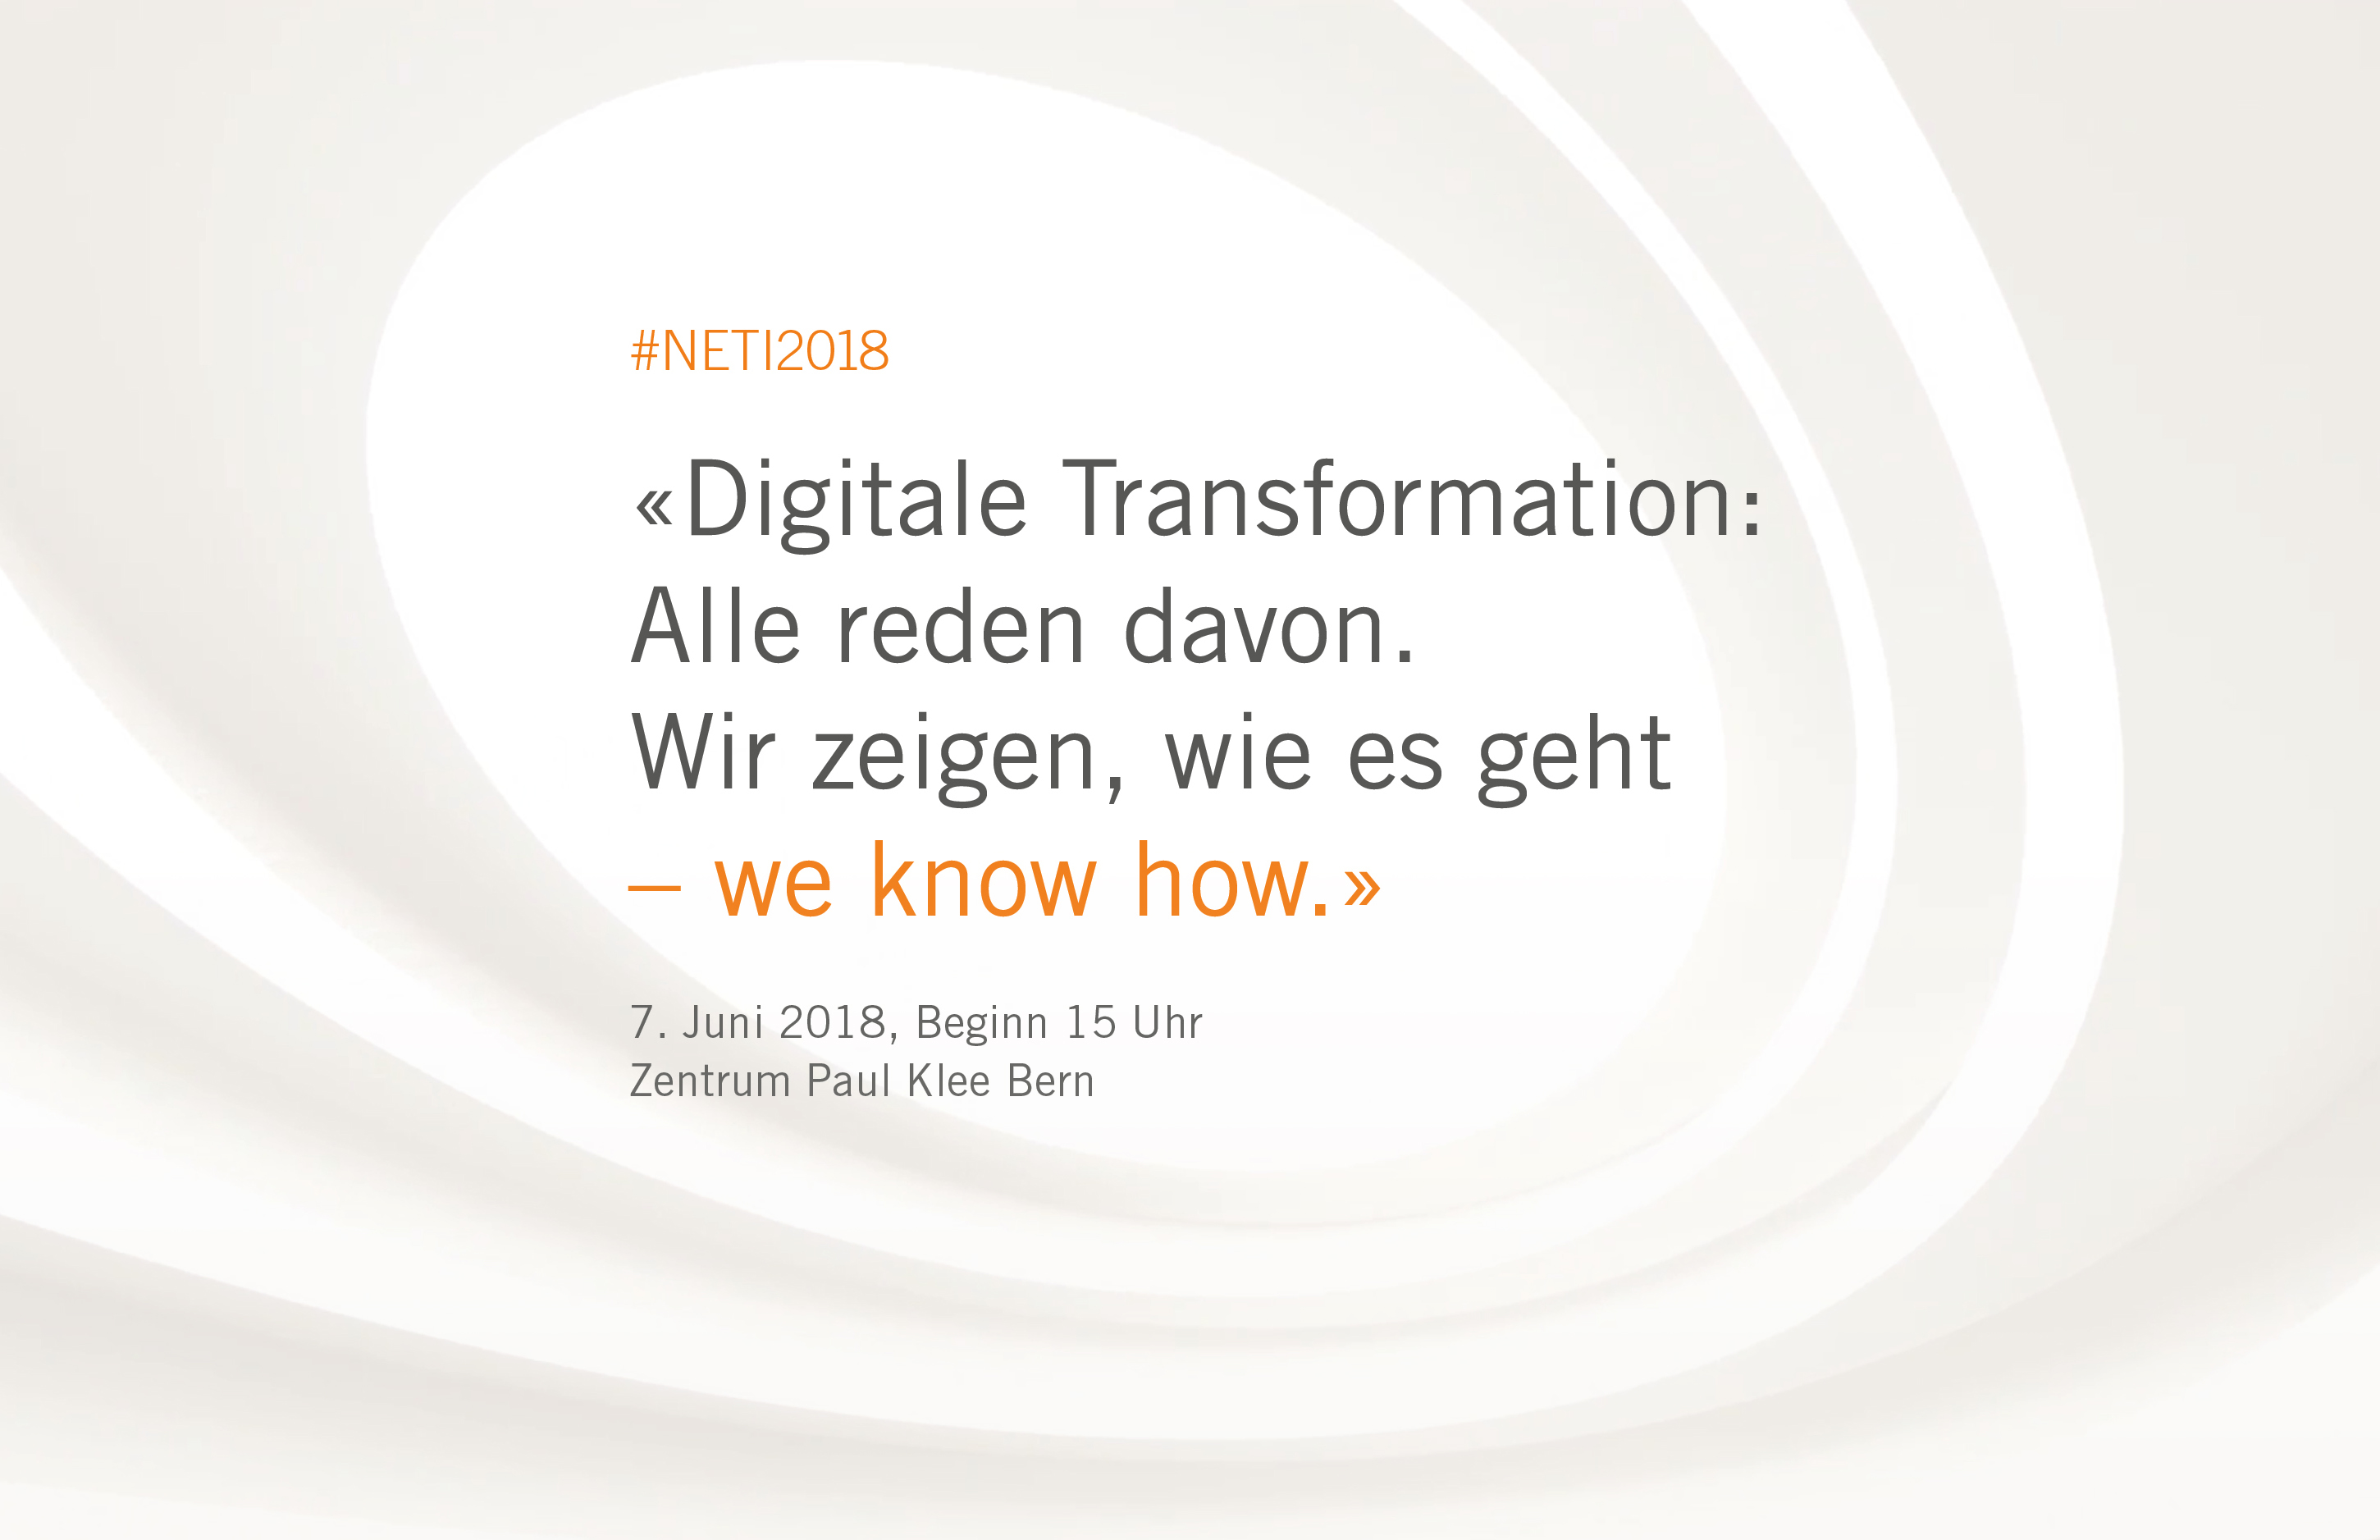 #NETI2018 Noser Engineering Technologie-Impulse in Bern